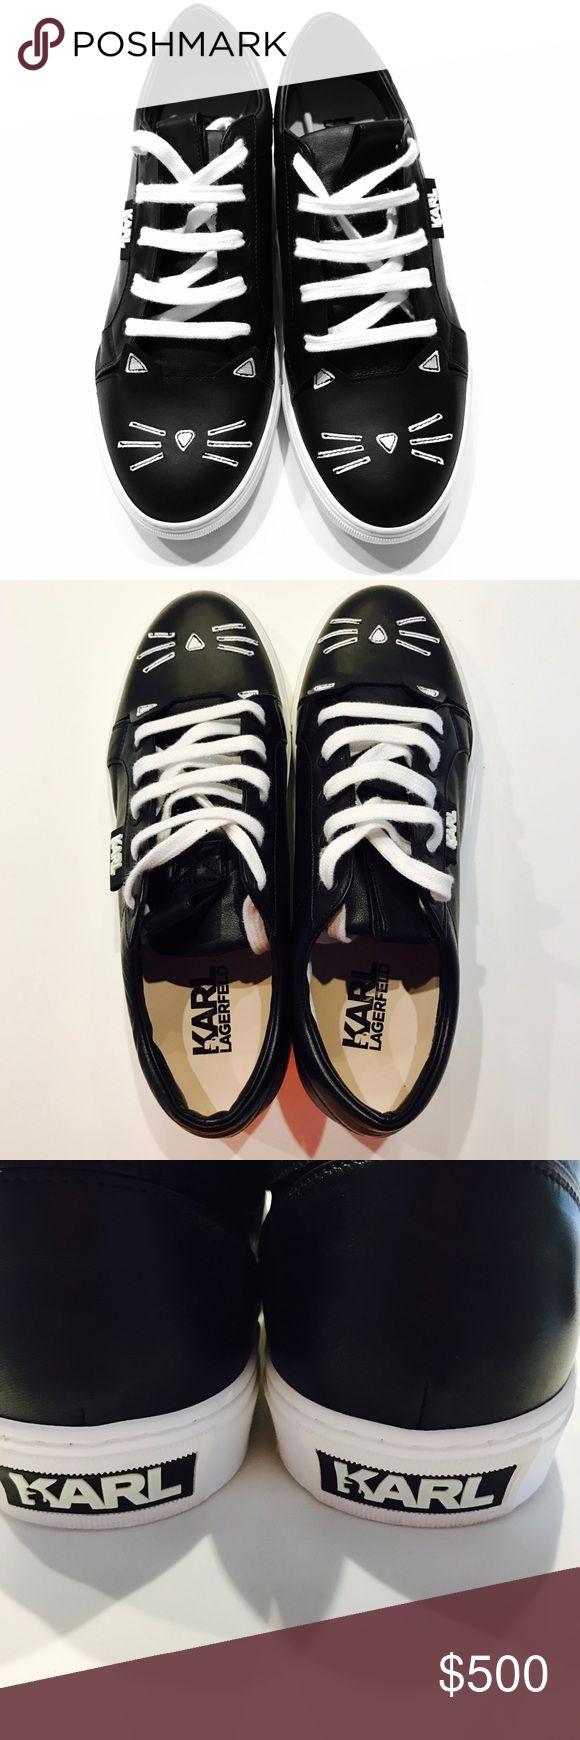 Karl Lagerfeld Choupette sneakers Brand new unworn Karl Lagerfeld F/W16 Choupette sneakers. Comes with original dust bag.  Size is EU41 Karl Lagerfeld Shoes Sneakers